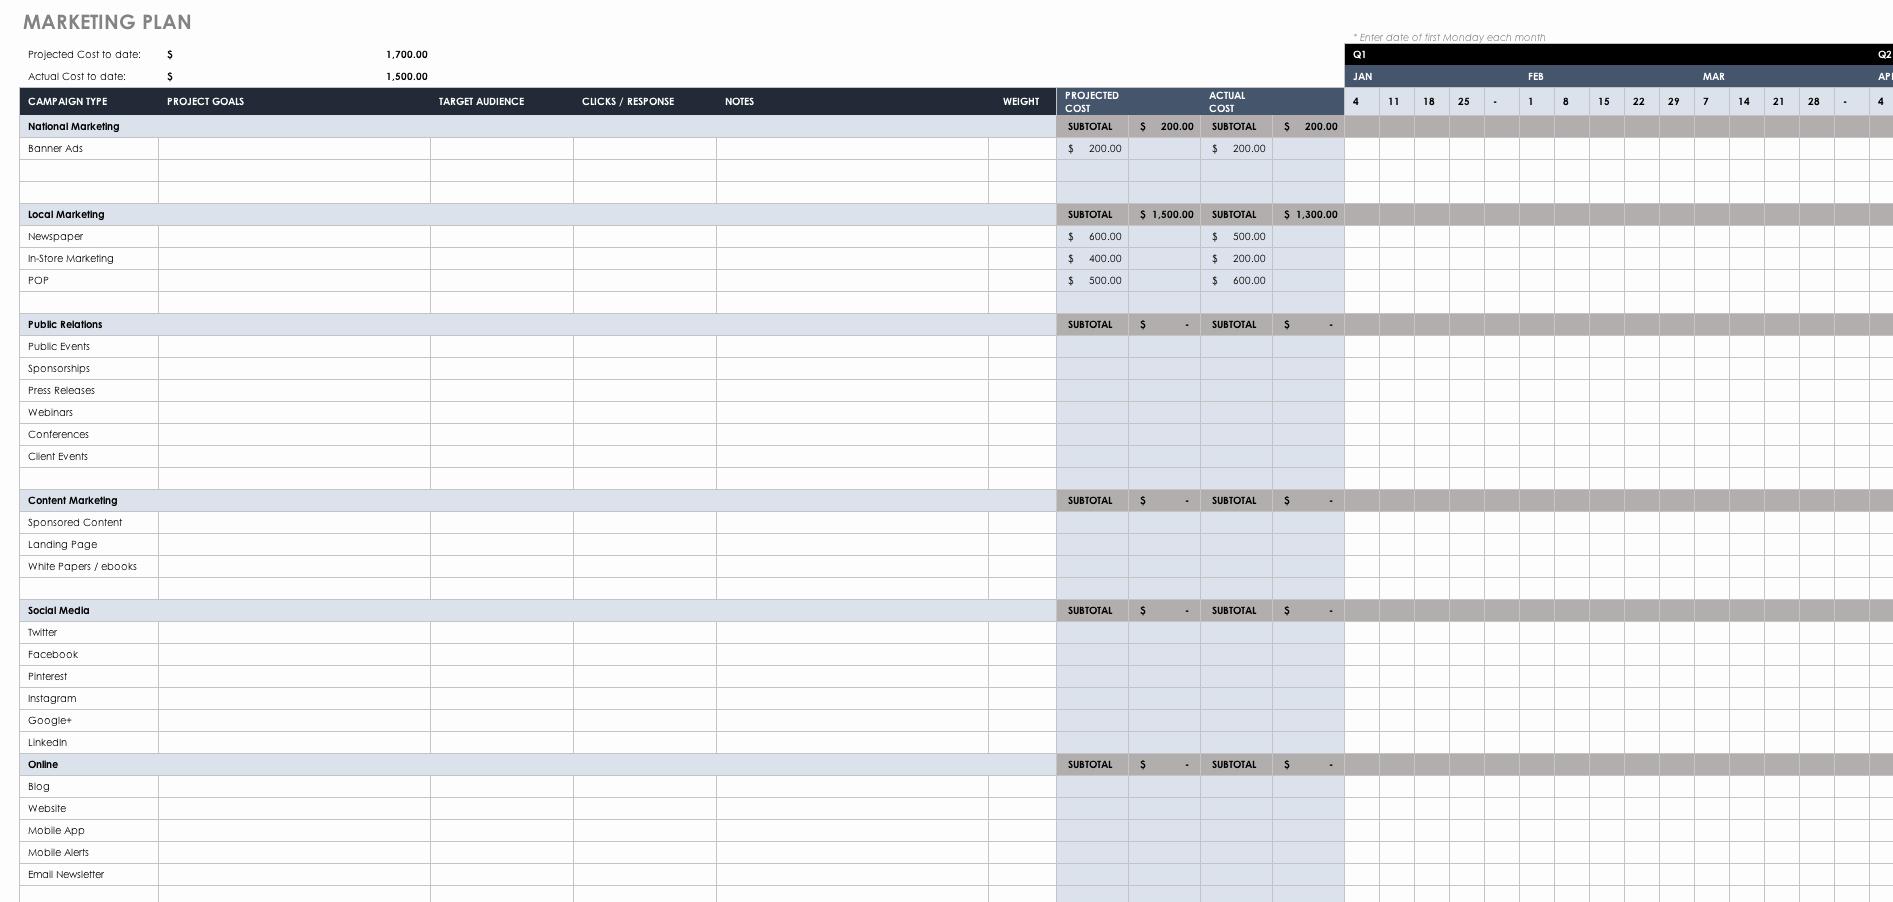 Marketing Plan Template Excel Elegant Free Marketing Plan Templates for Excel